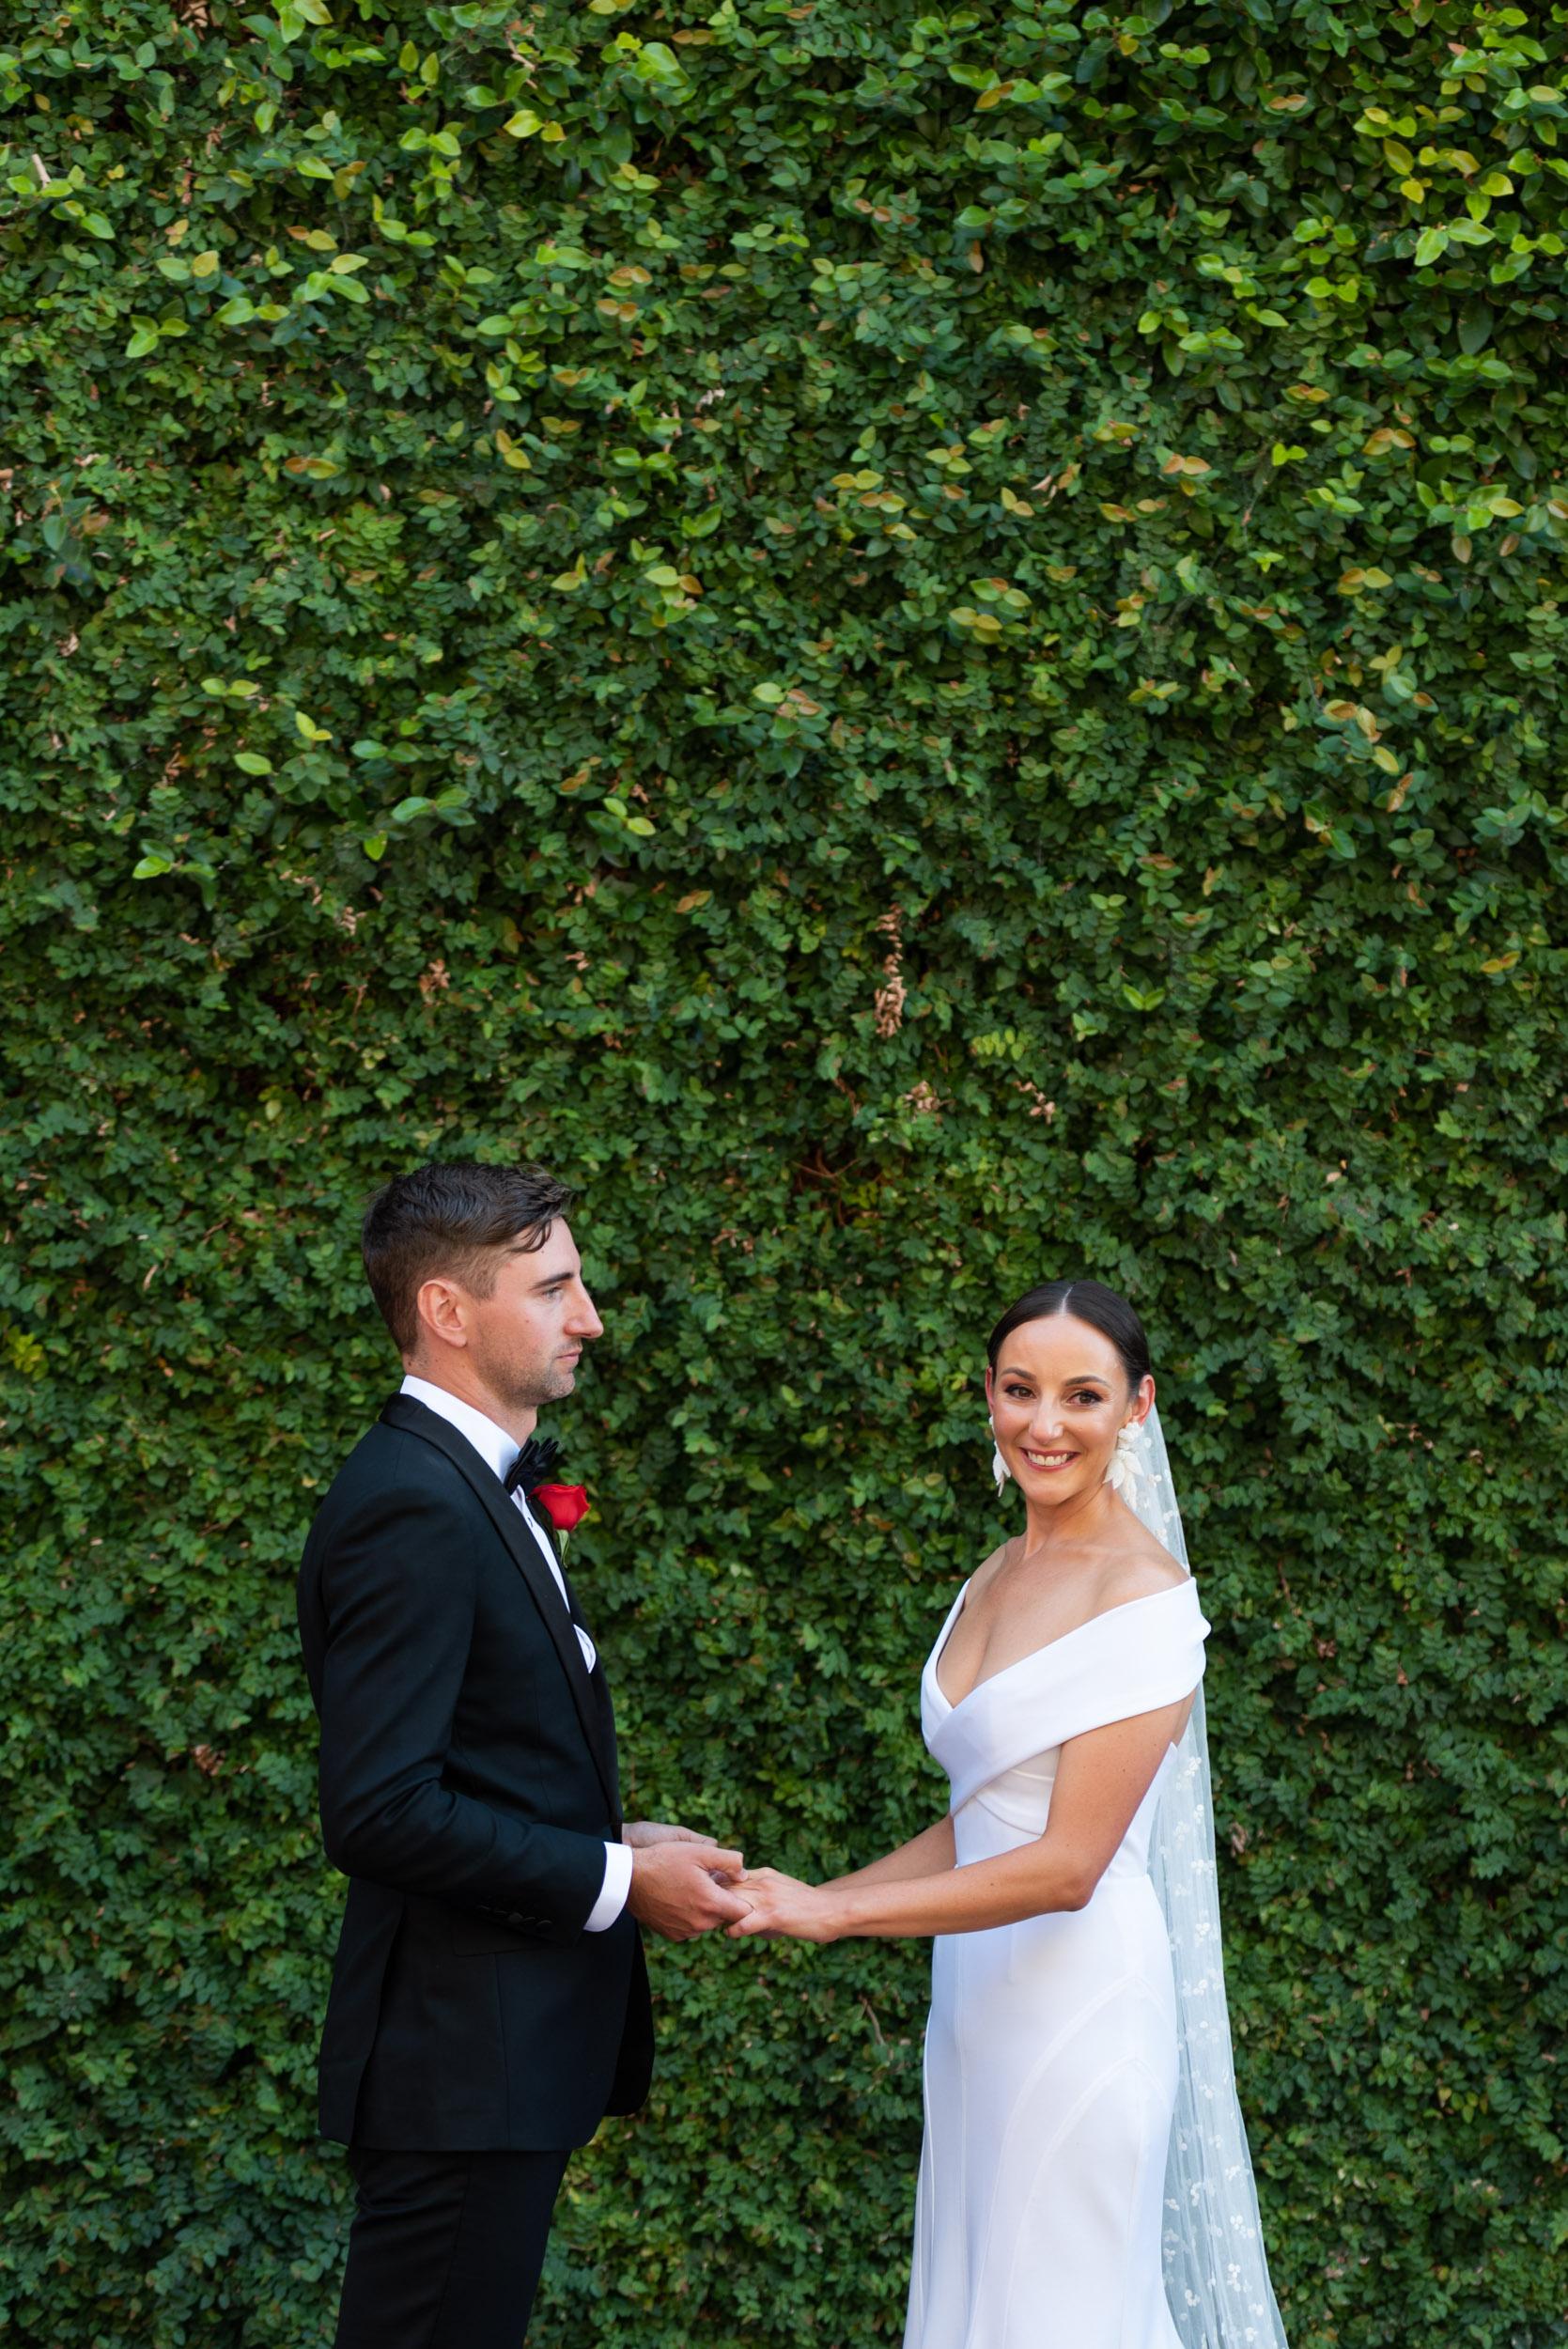 Wedding, Wedding Day, Bride & Groom, Hand in Marriage, Butler Lane Richmond, Butler Lane by Peter Rowland